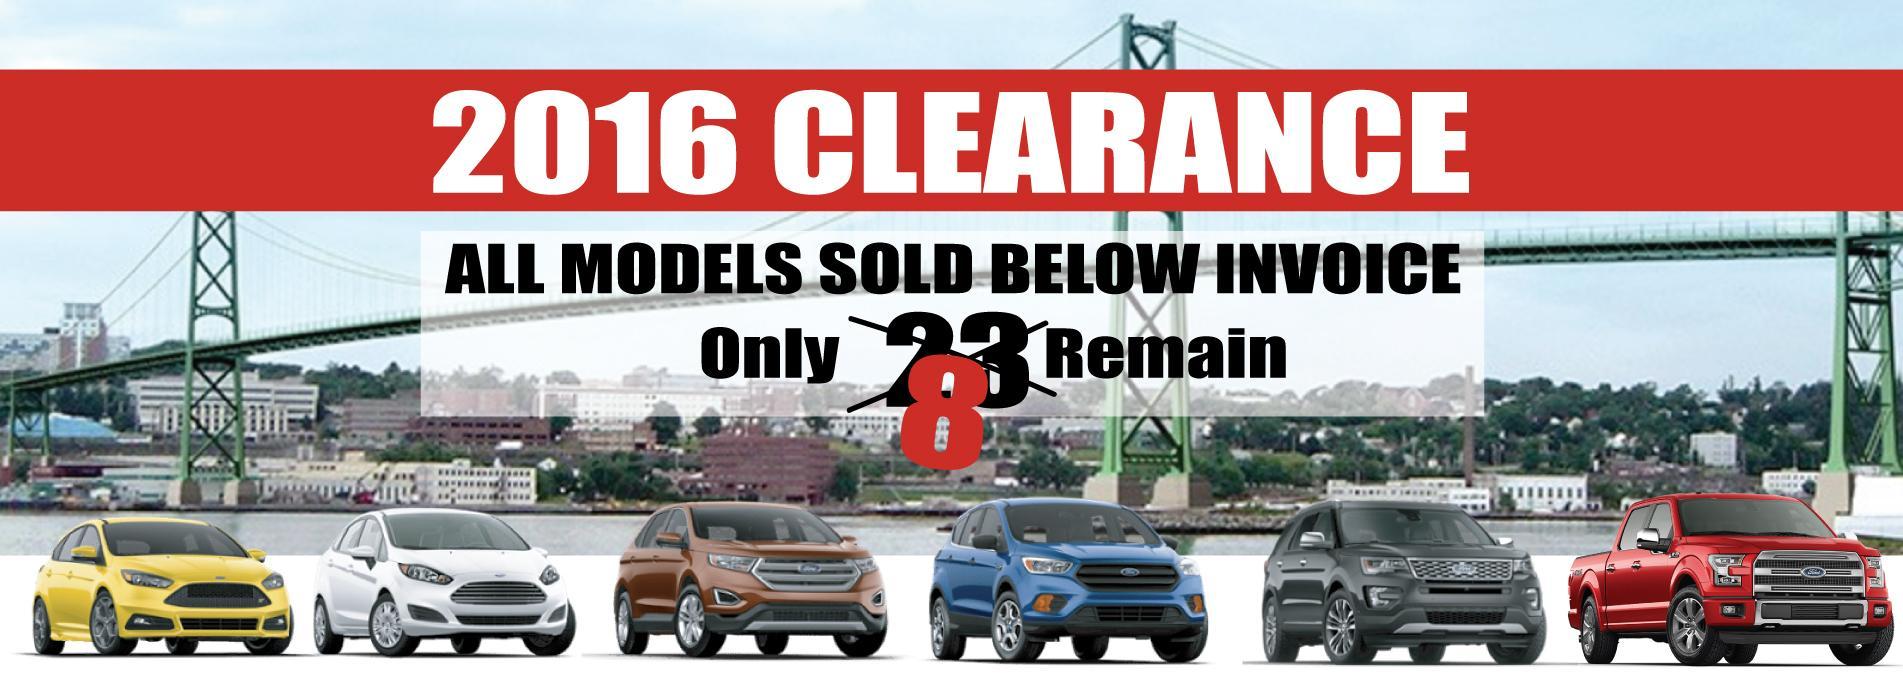 2016 Clearance